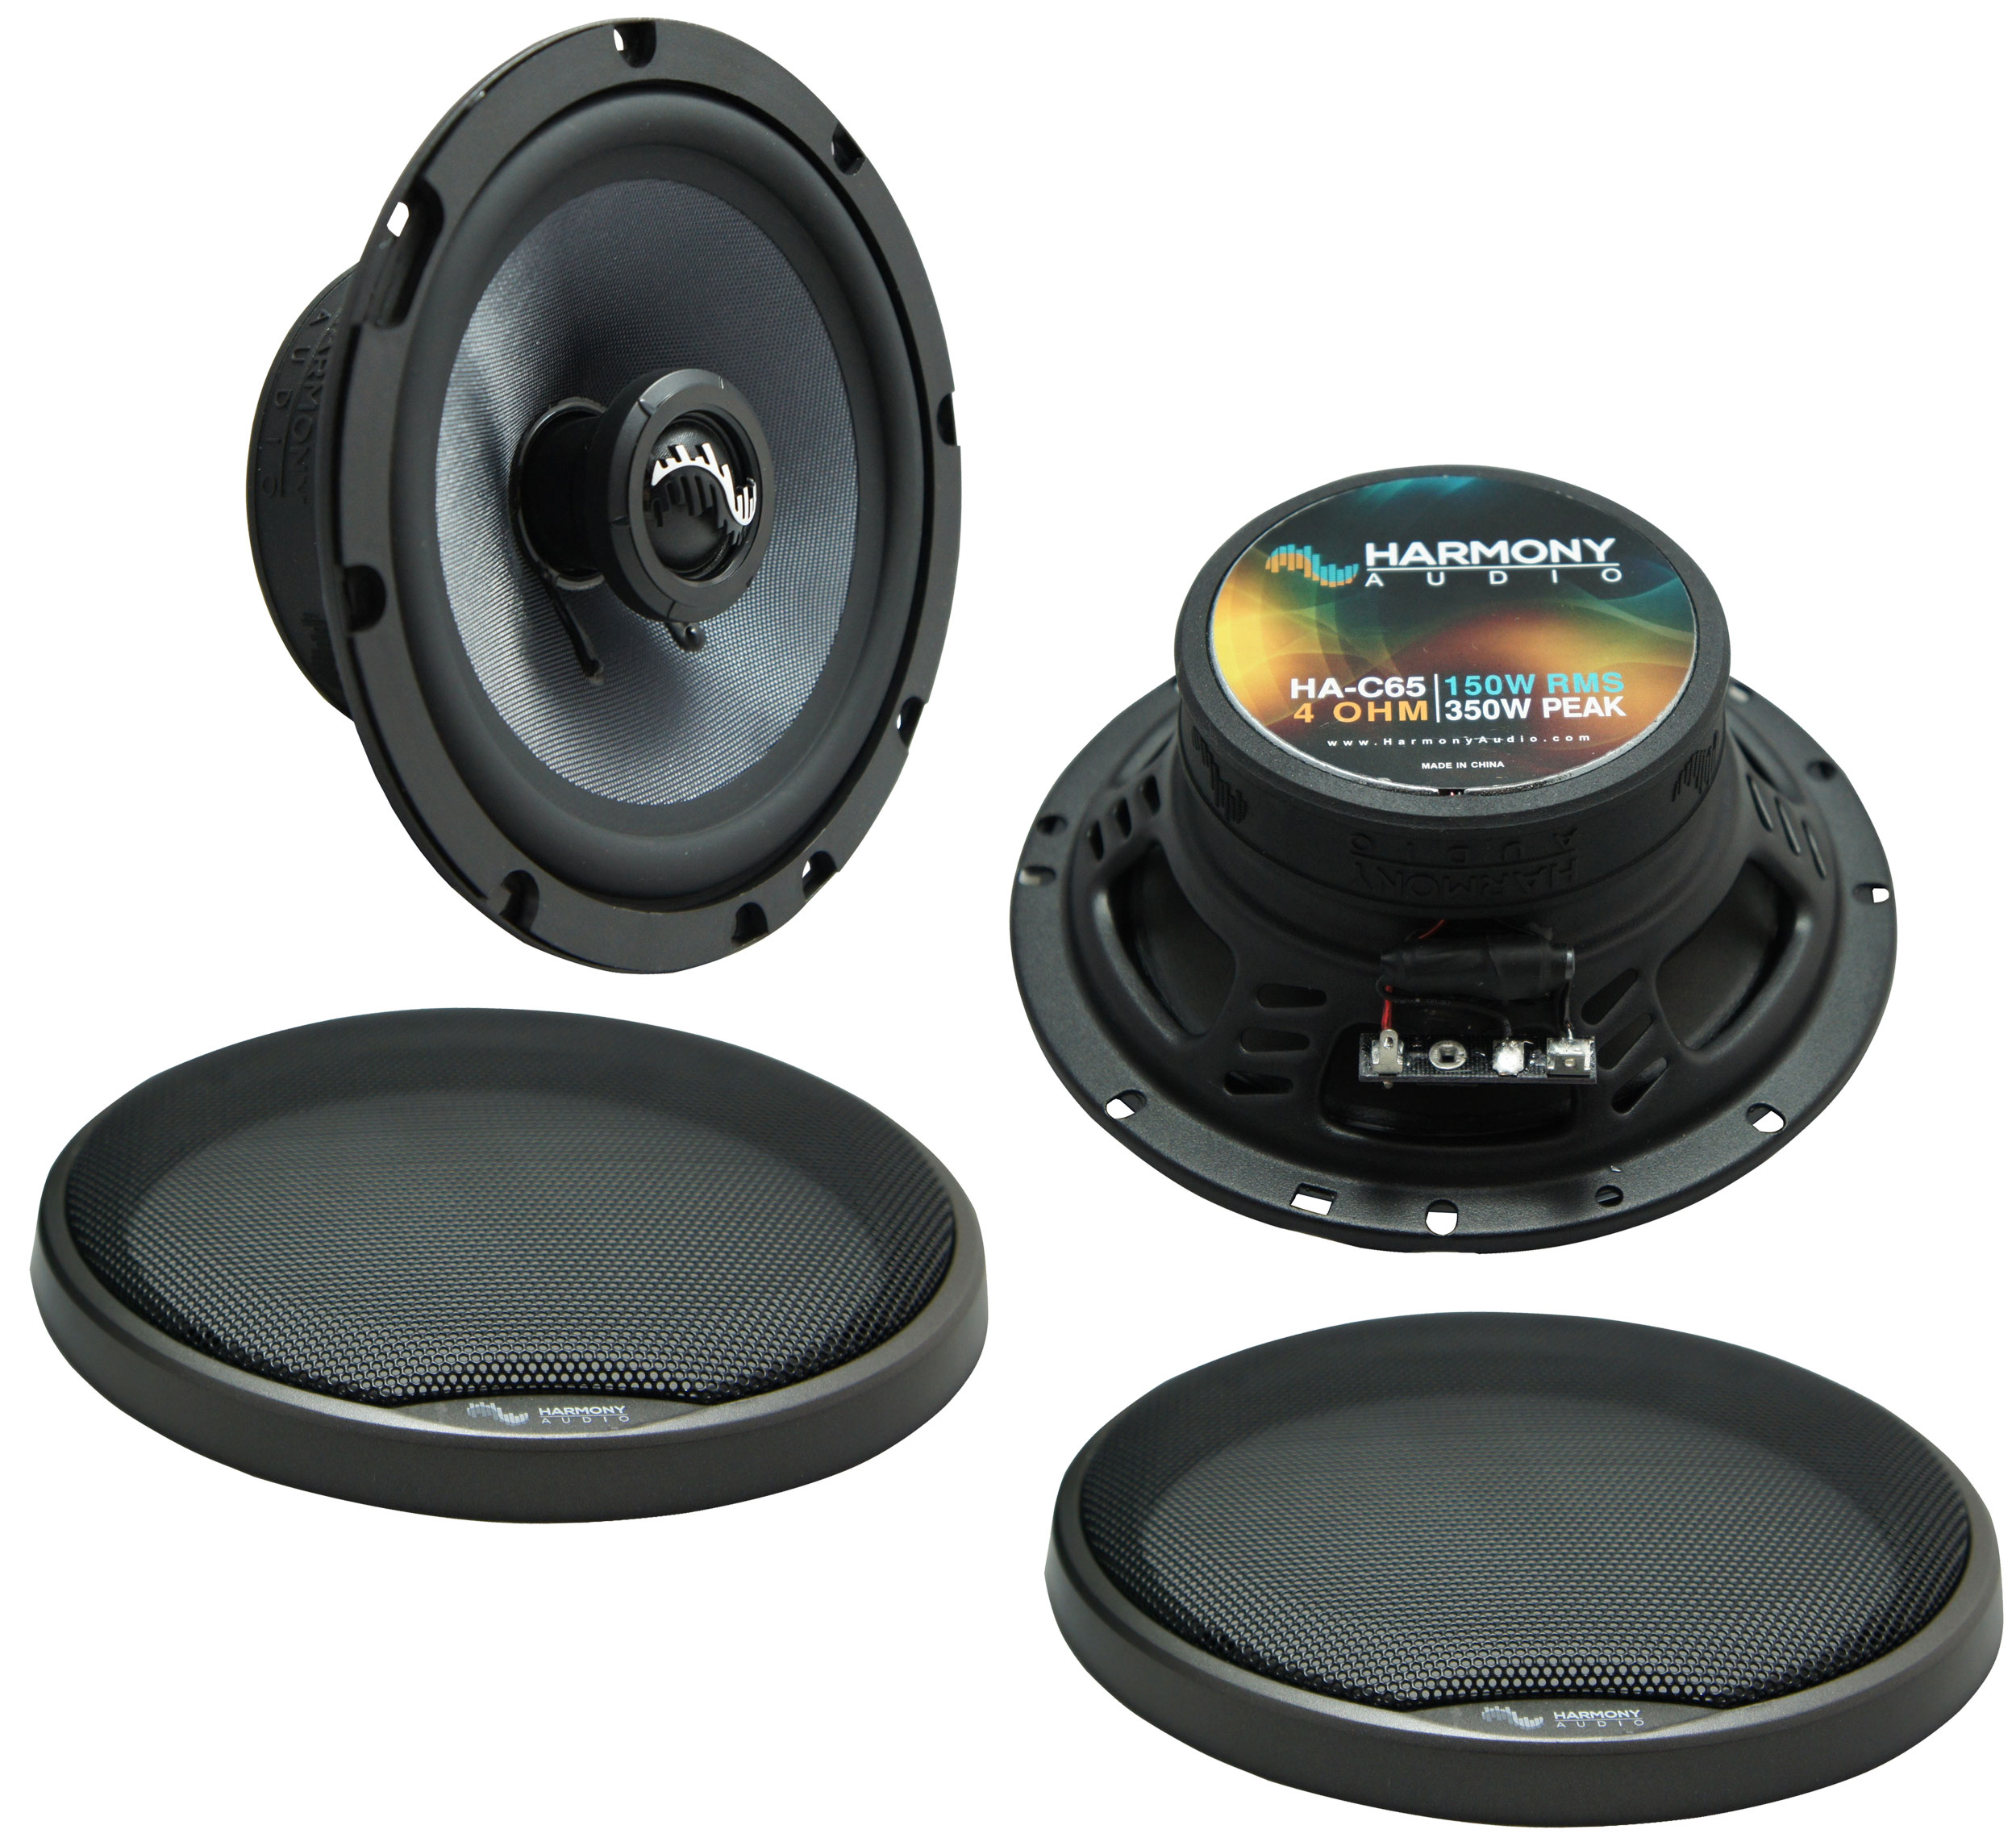 Fits Acura TL 2004-2008 Front Door Replacement Speaker Harmony HA-C65 Premium Speakers